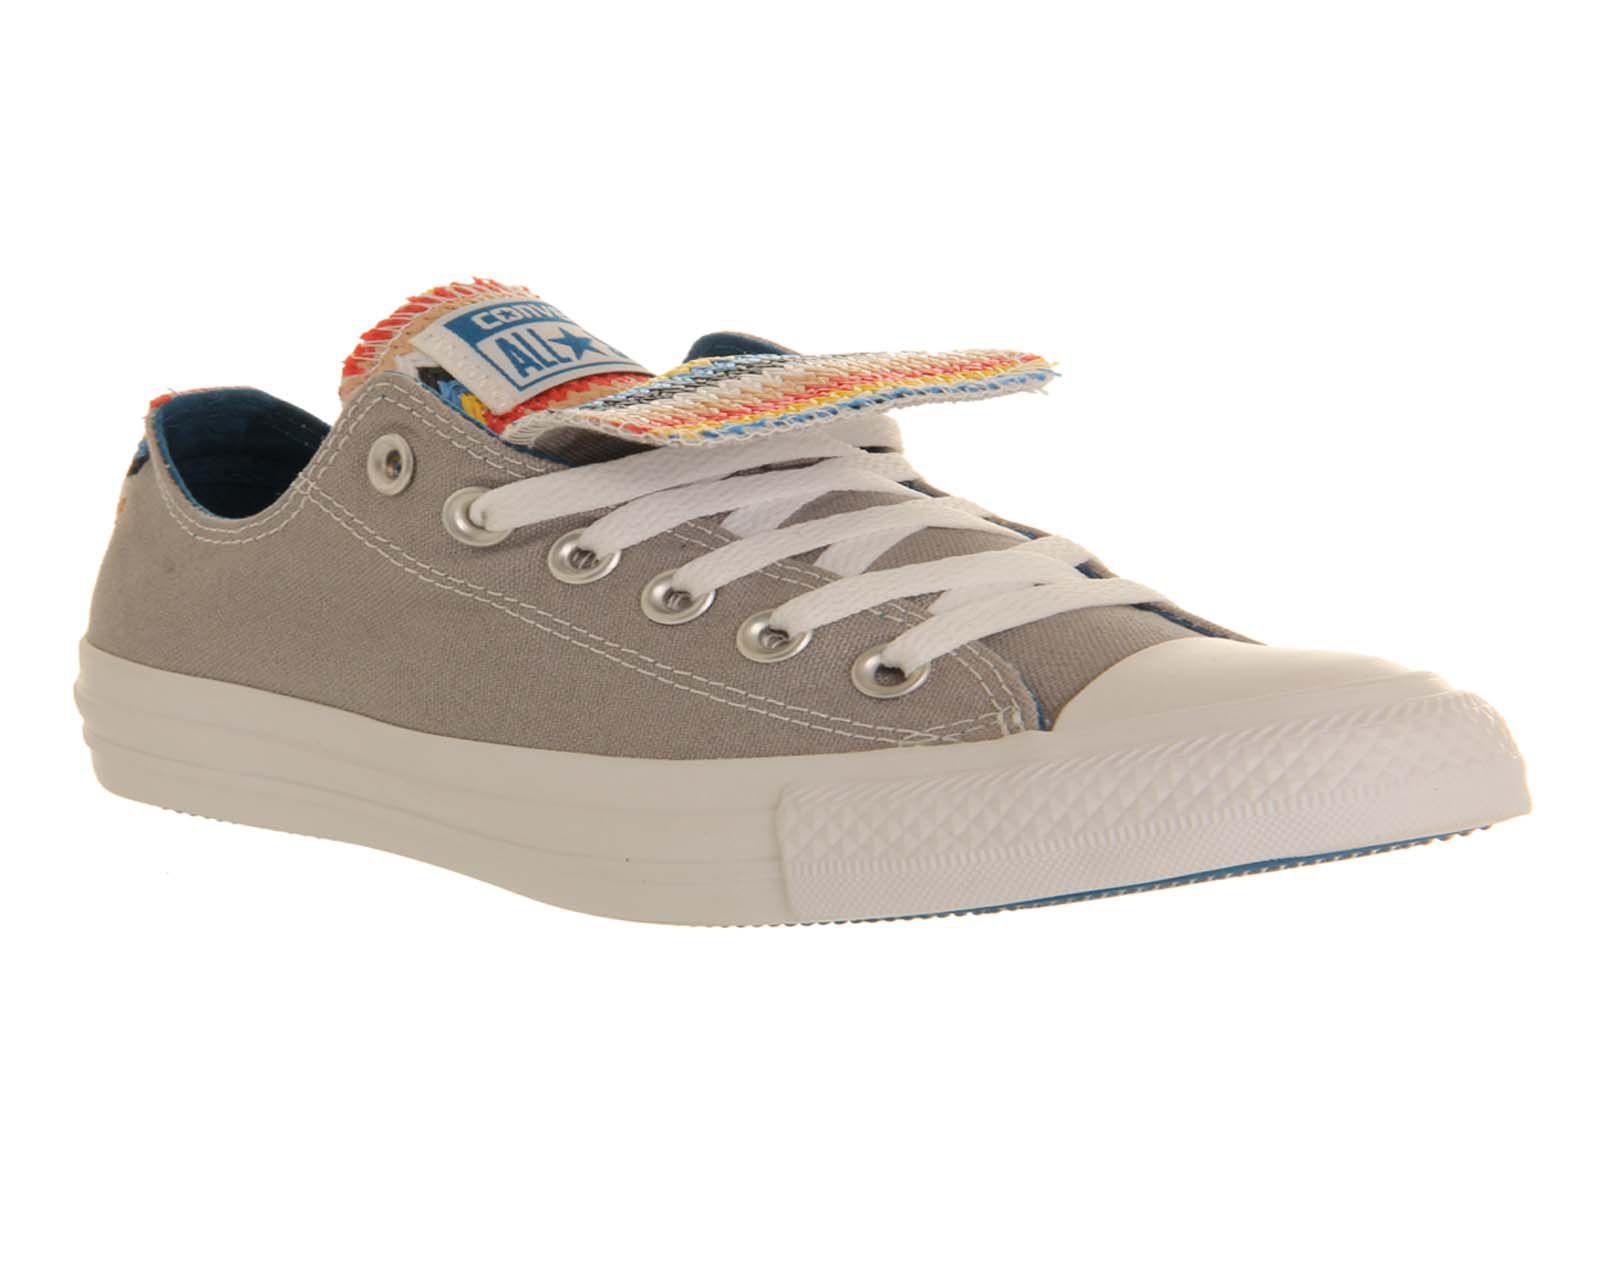 Converse Allstar Low Double Tongue Shoes